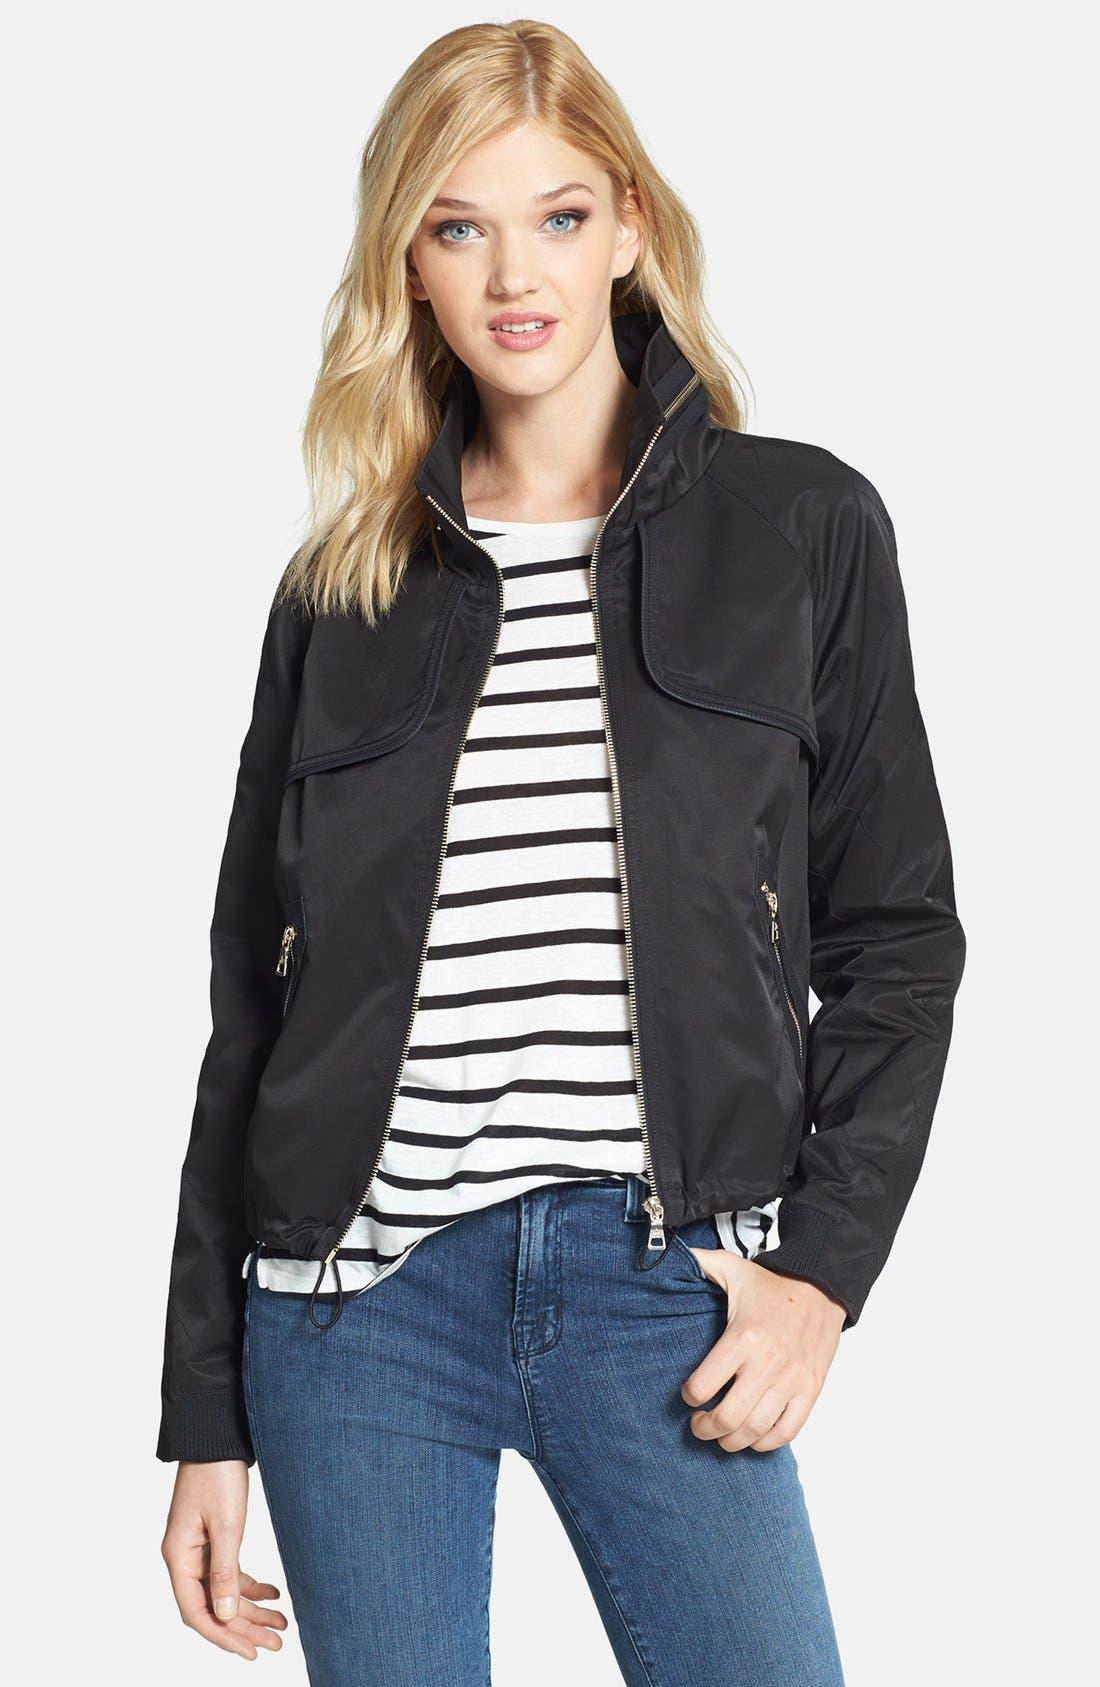 Main Image - Sam Edelman 'Stacie' Front Zip Jacket